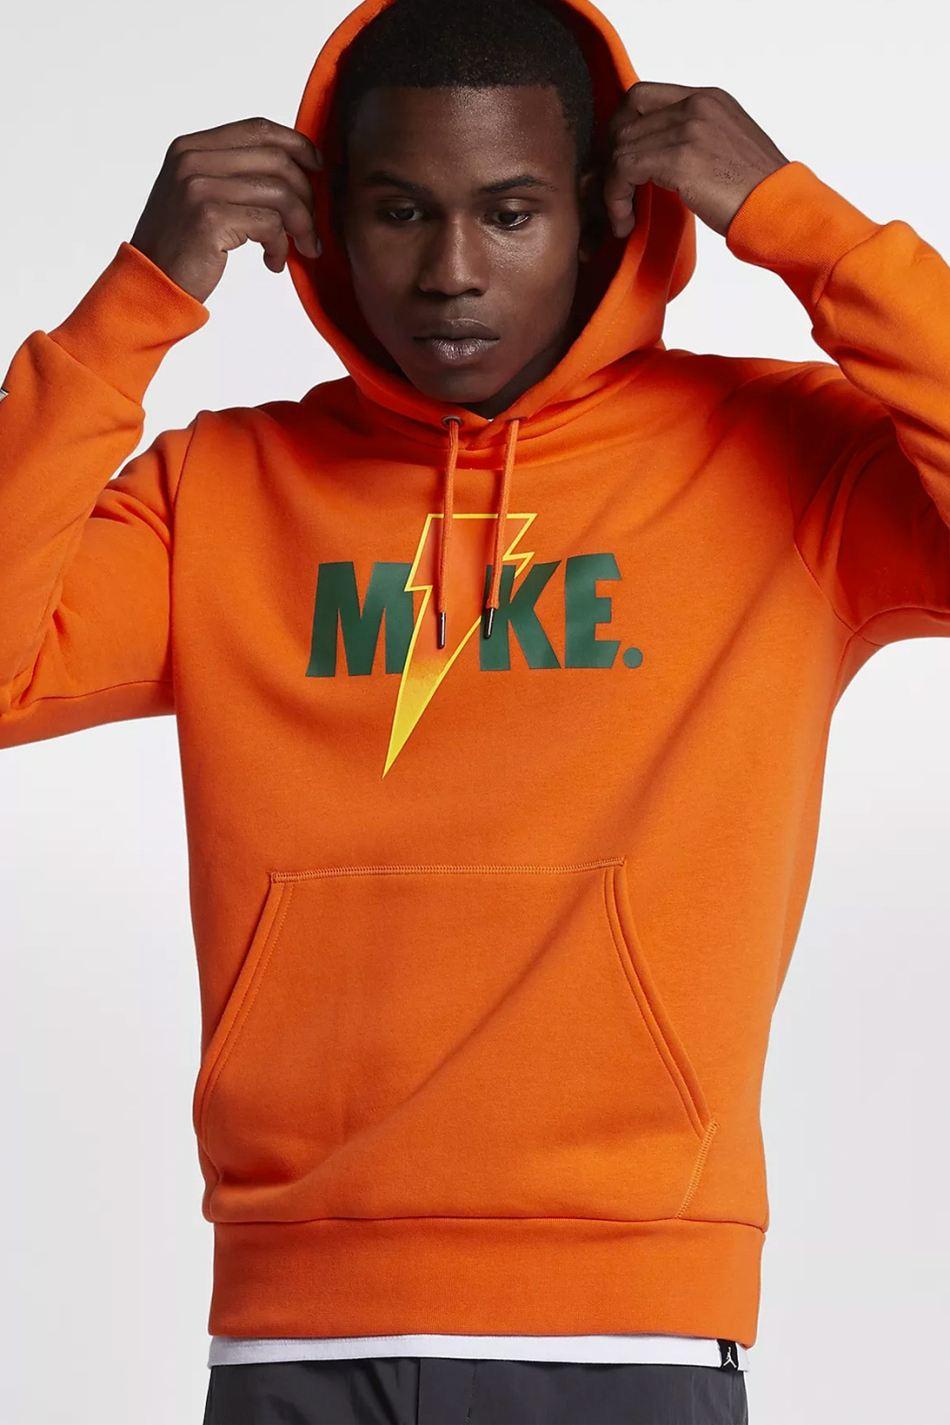 http3a2f2fhypebeast-com2fimage2f20172f112fnike-air-jordan-gatorade-apparel-collection-1